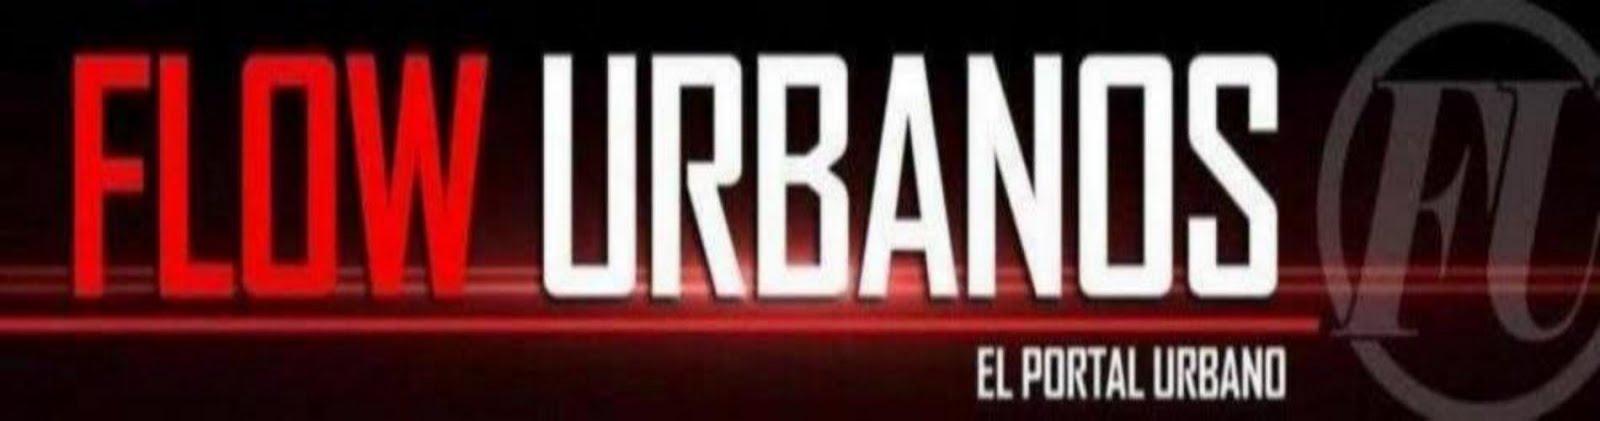 FlowUrbanos.Net - Reggaeton, Videos, Musica Urbana, y Latina